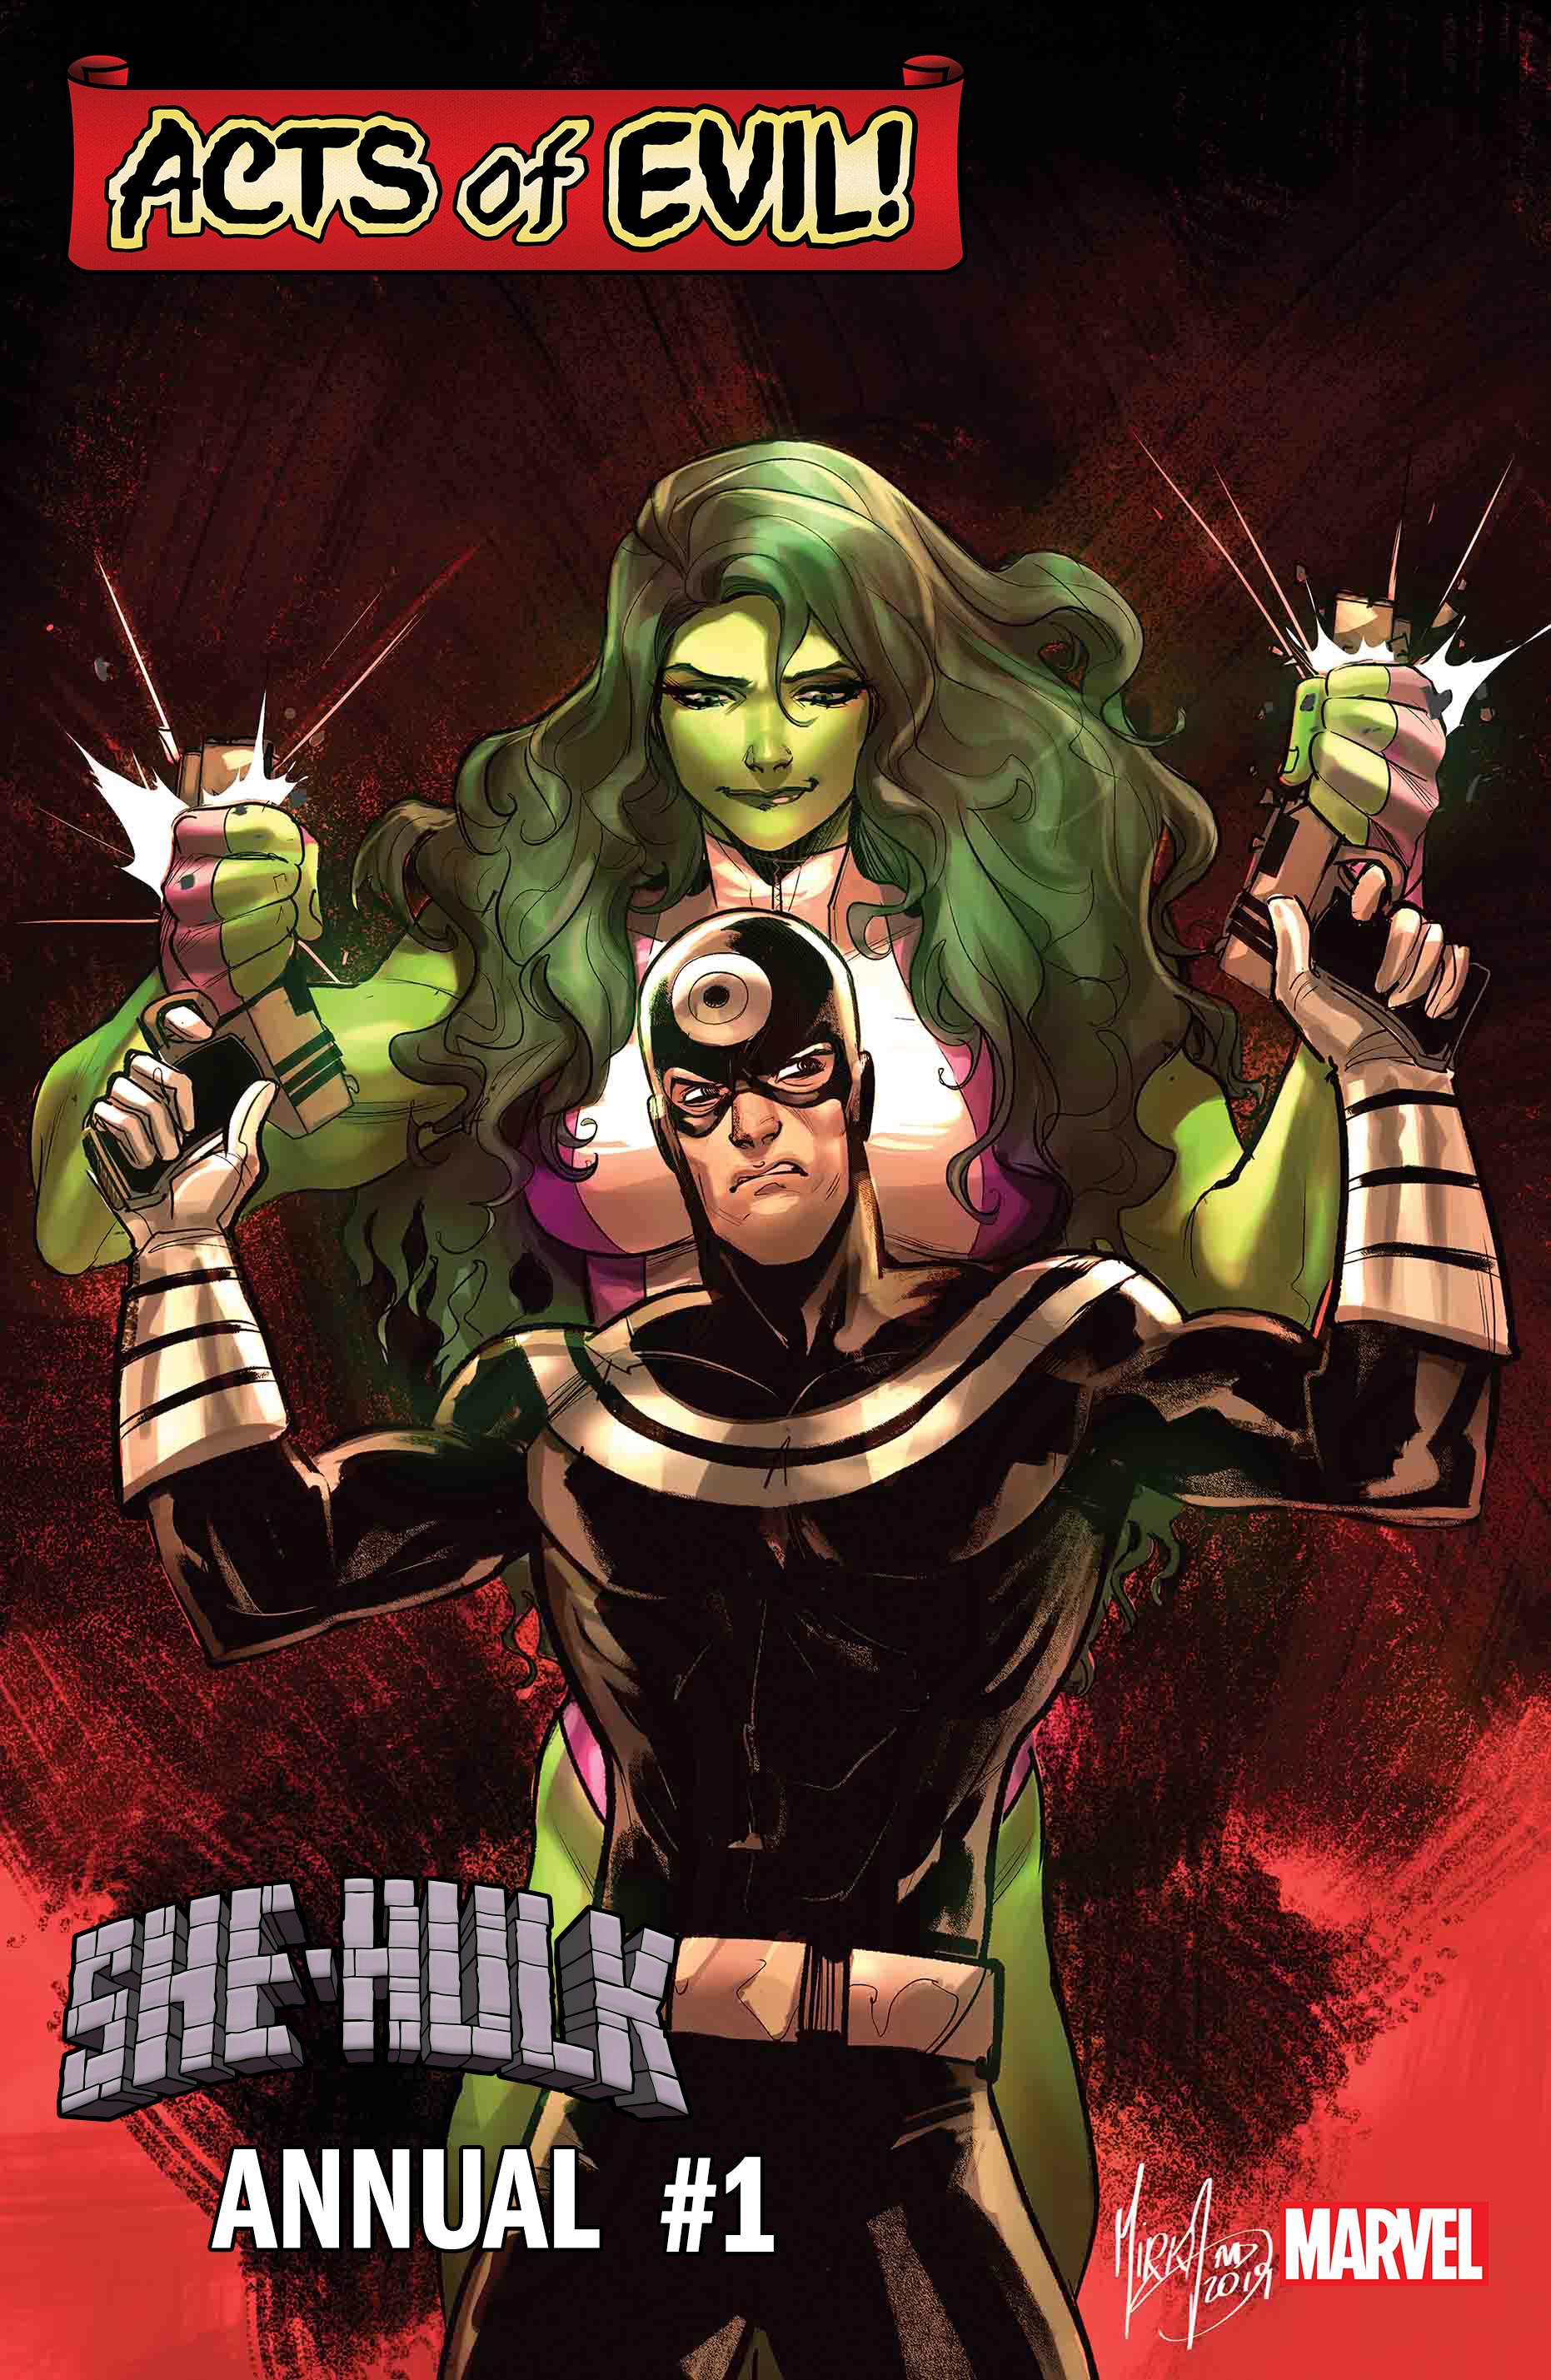 She-Hulk Annual #1: She-Hulk vs. Bullseye cover